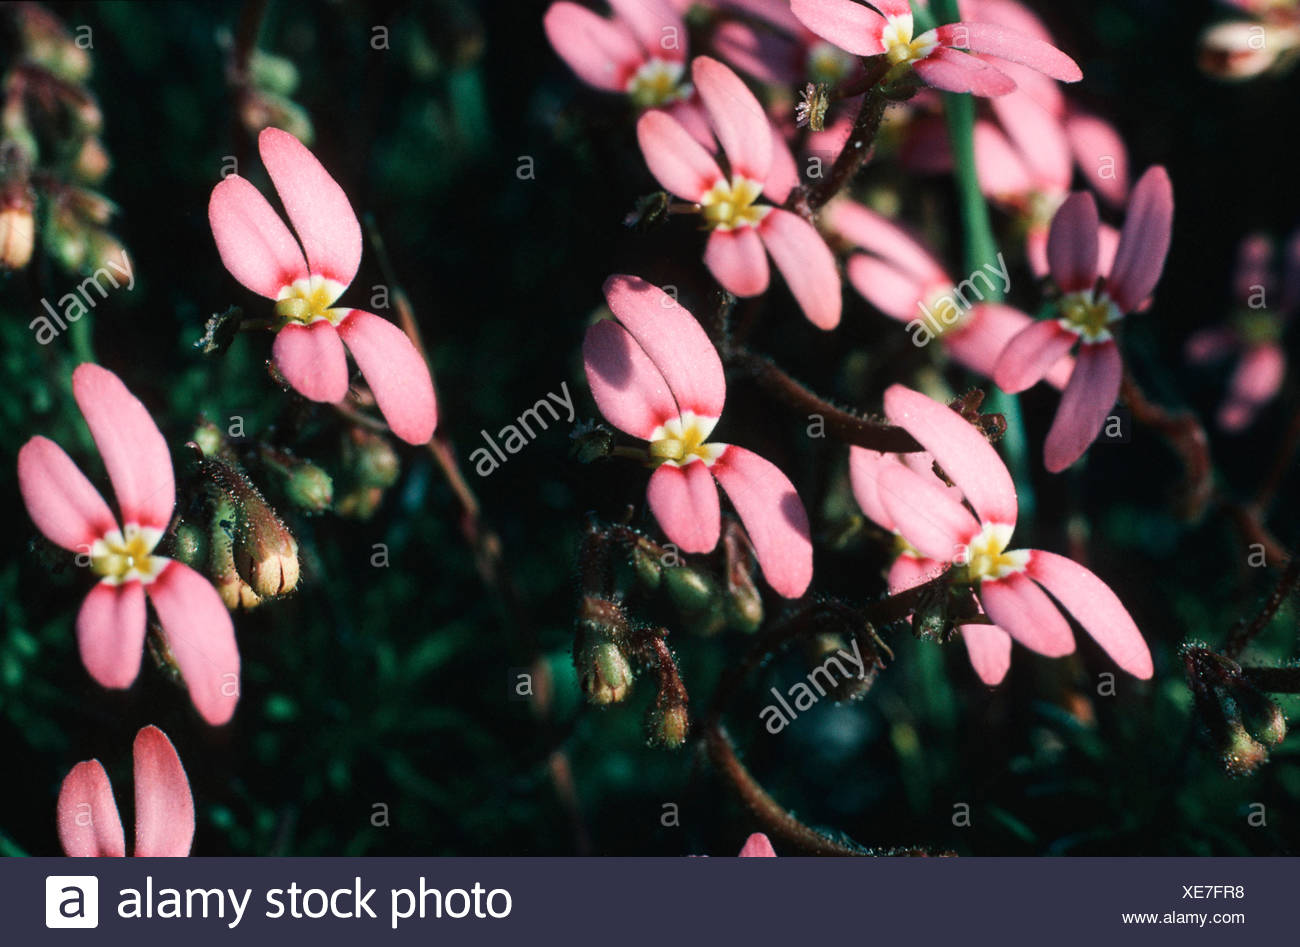 Grass triggerplant, Grass trigger plant (Stylidium bulbiferum), blooming - Stock Image